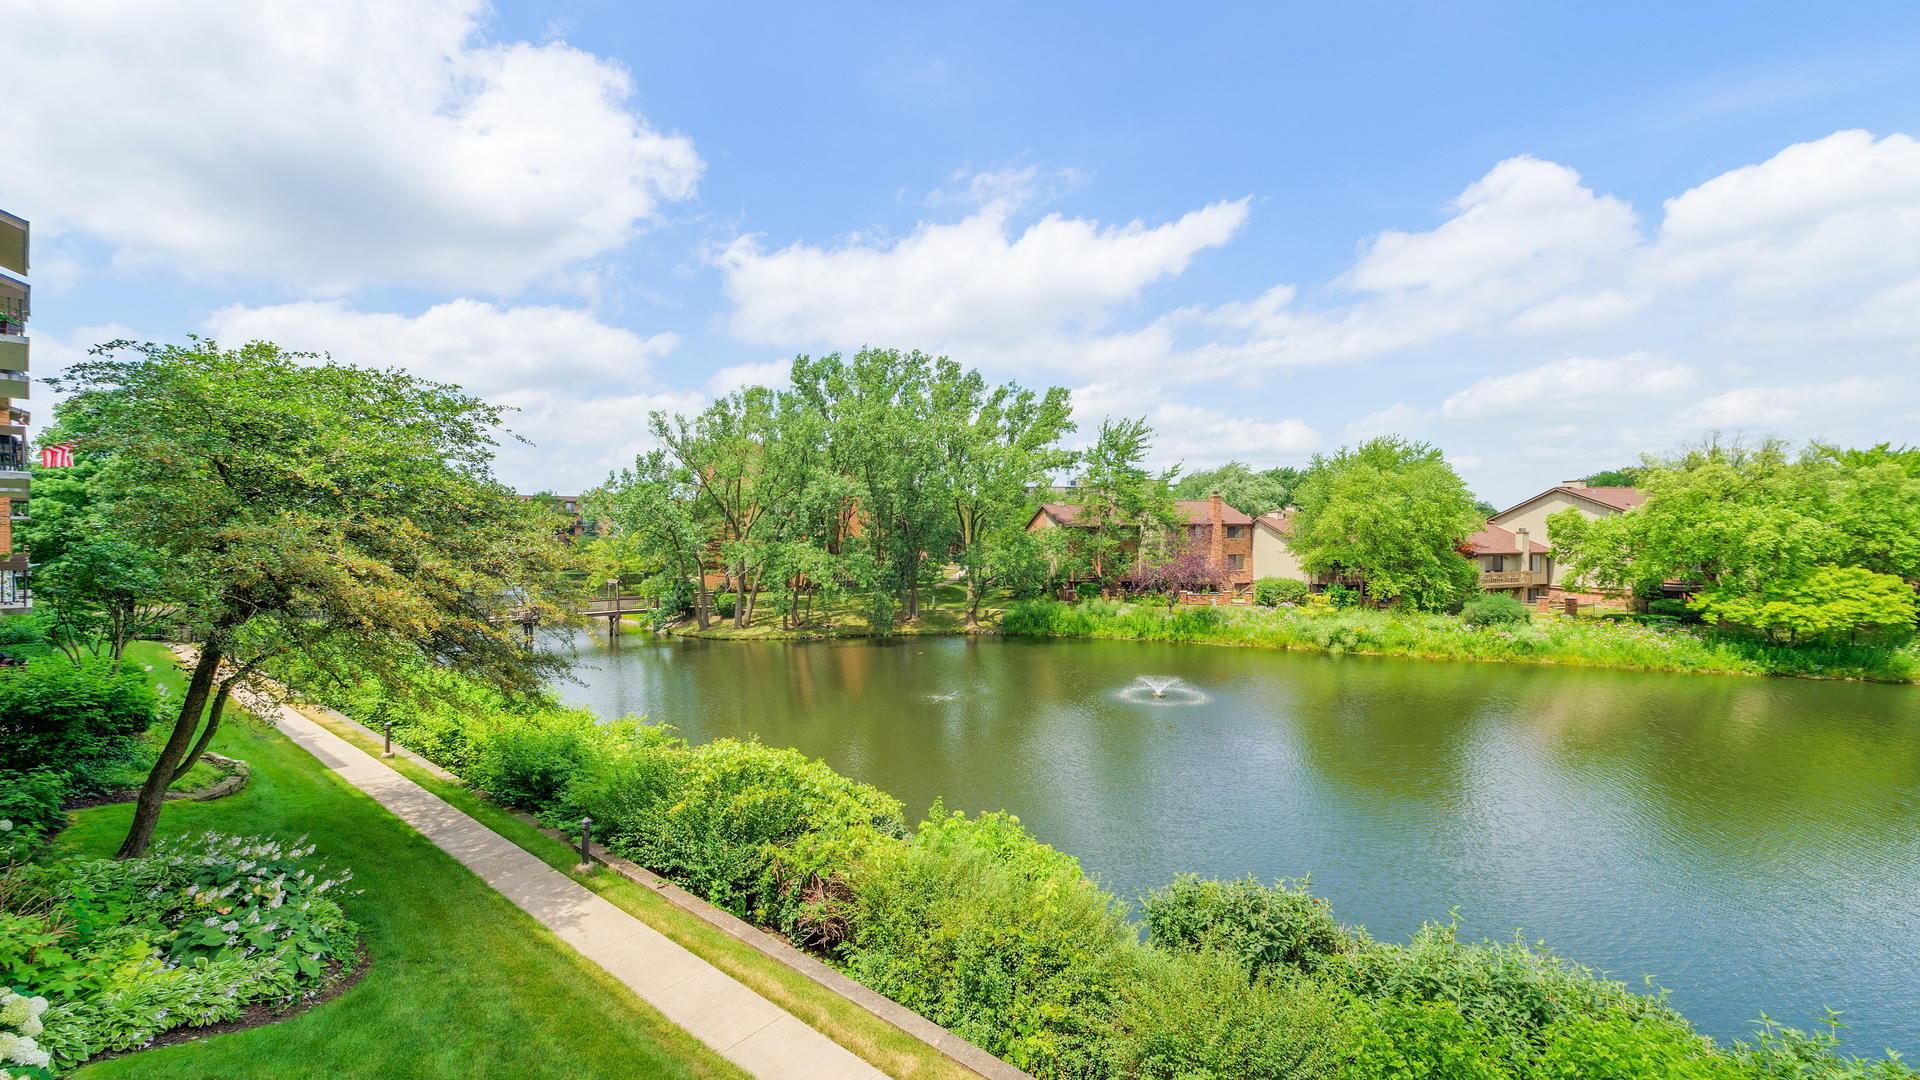 201 Lake Hinsdale 203, WILLOWBROOK, Illinois, 60527